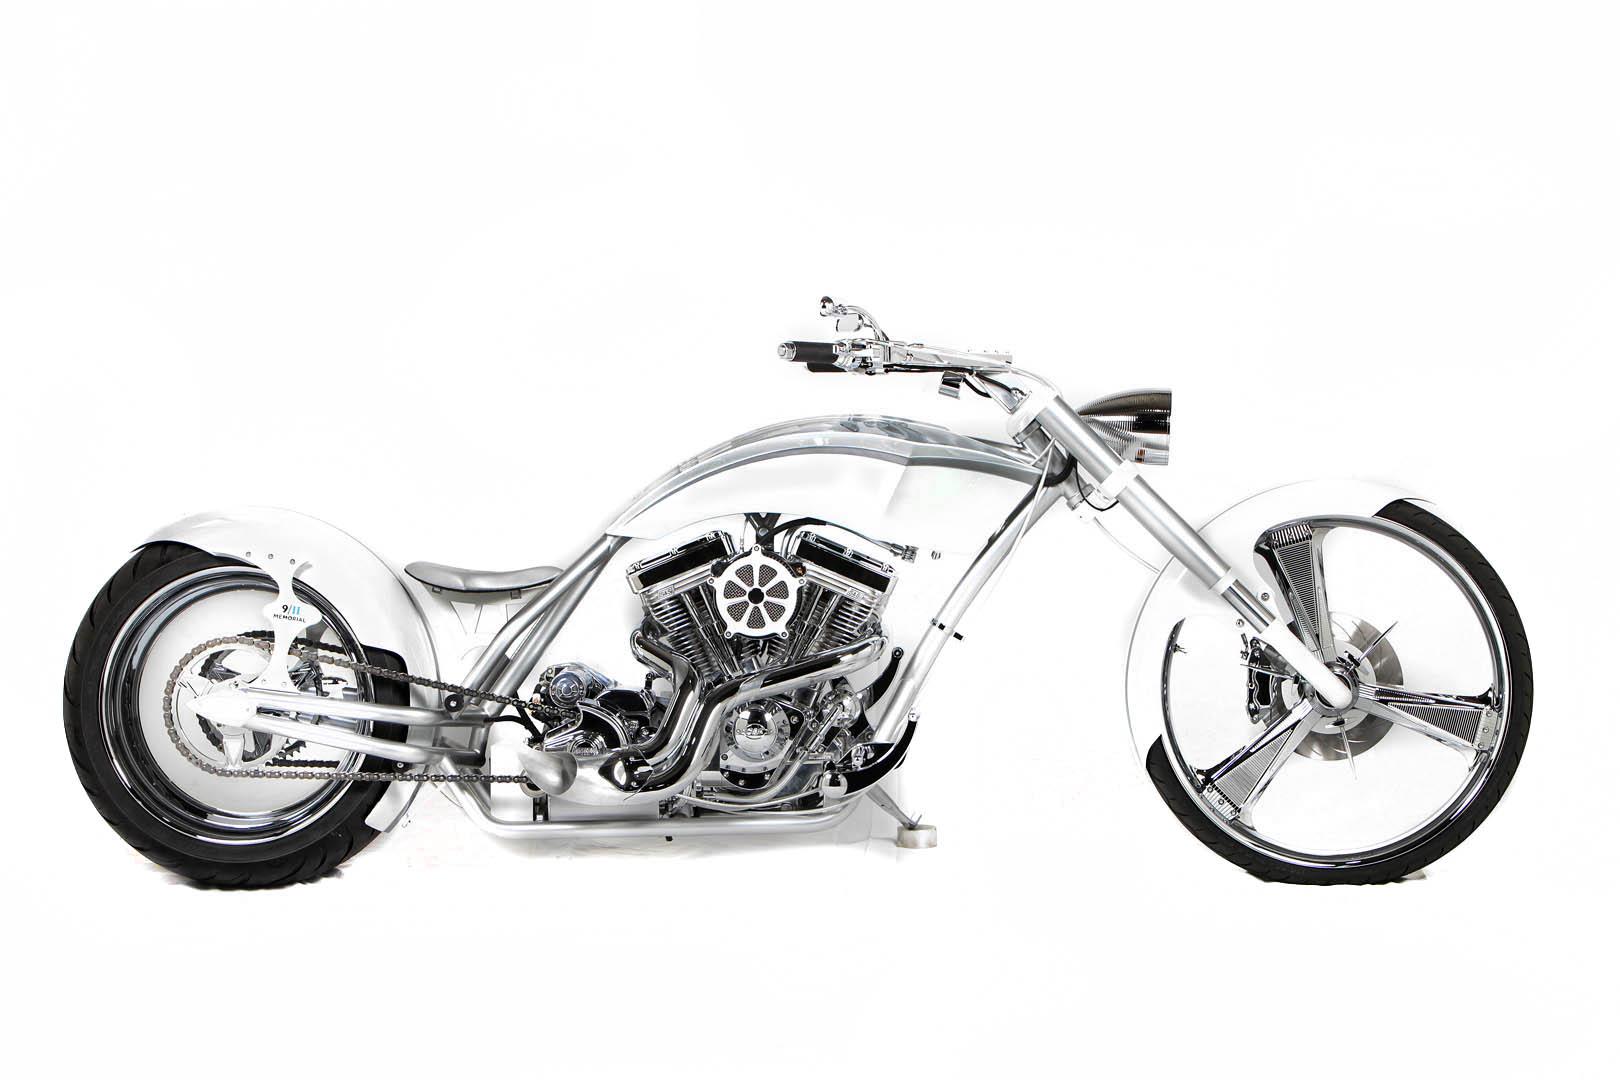 paul-jr-designs-911-giveaway-bike-007